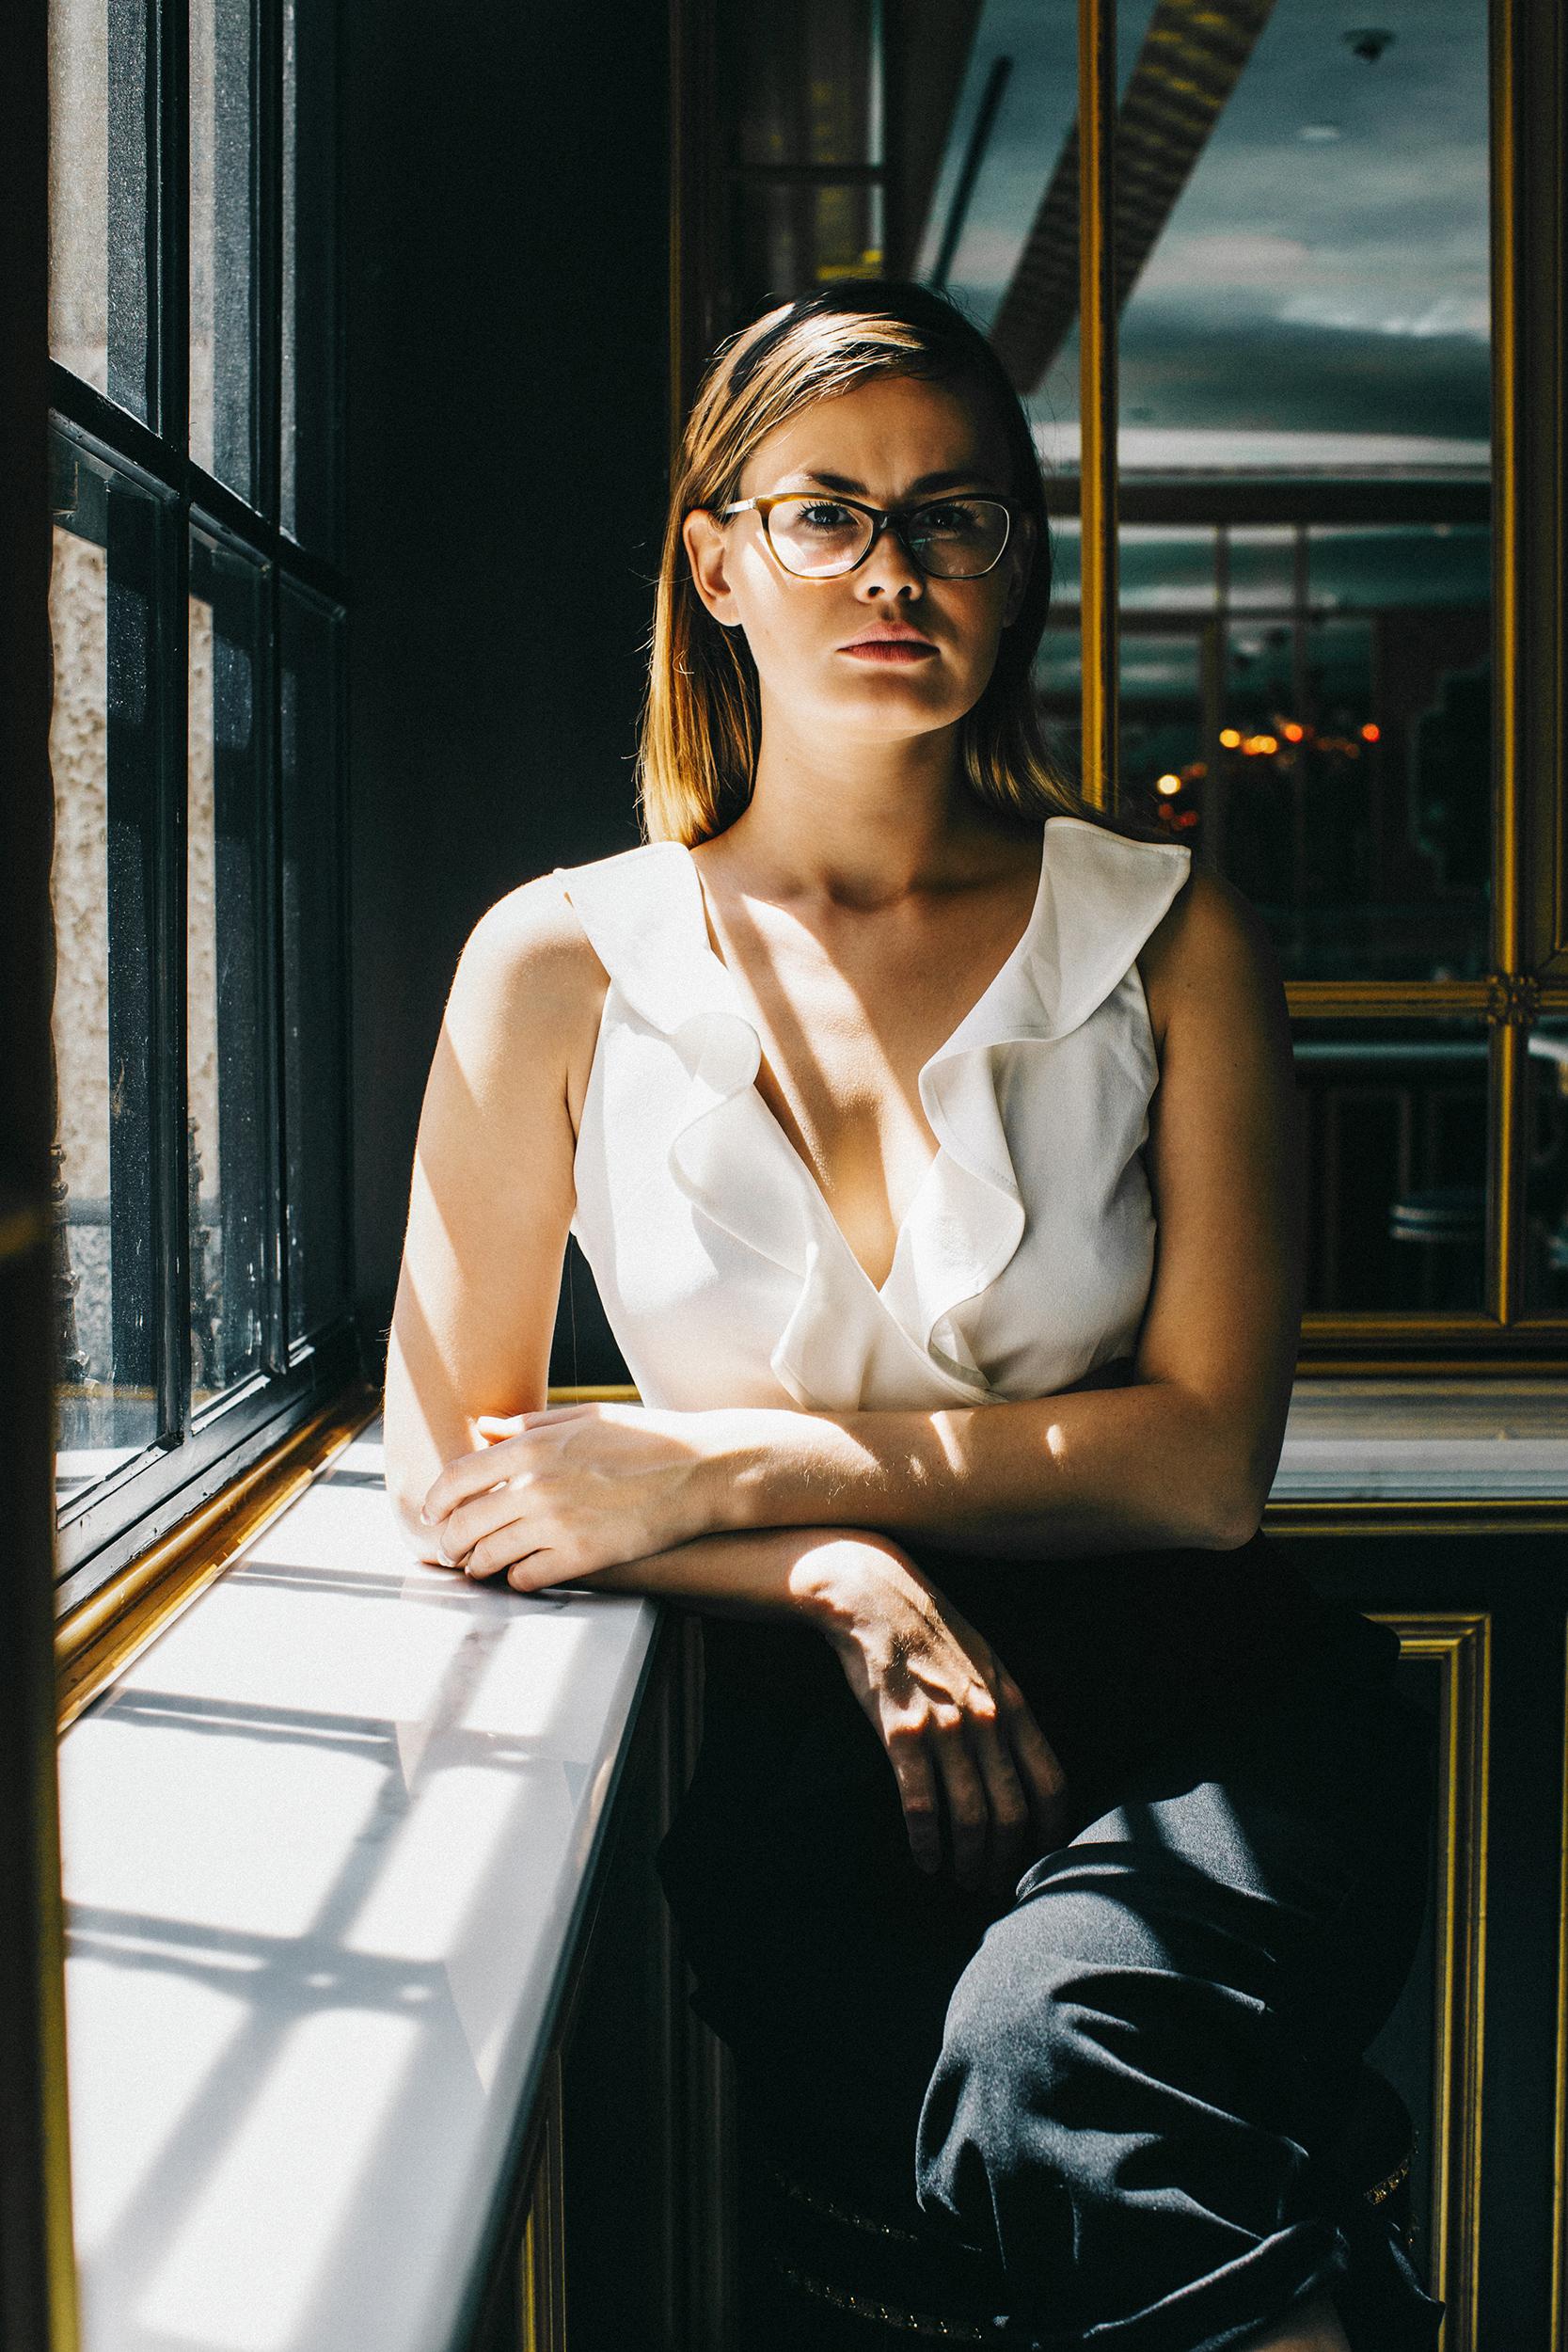 Los_Angeles_Irina_for_Nomad_Hotel_Assignment_Photographer-Julien-Balmer.jpg